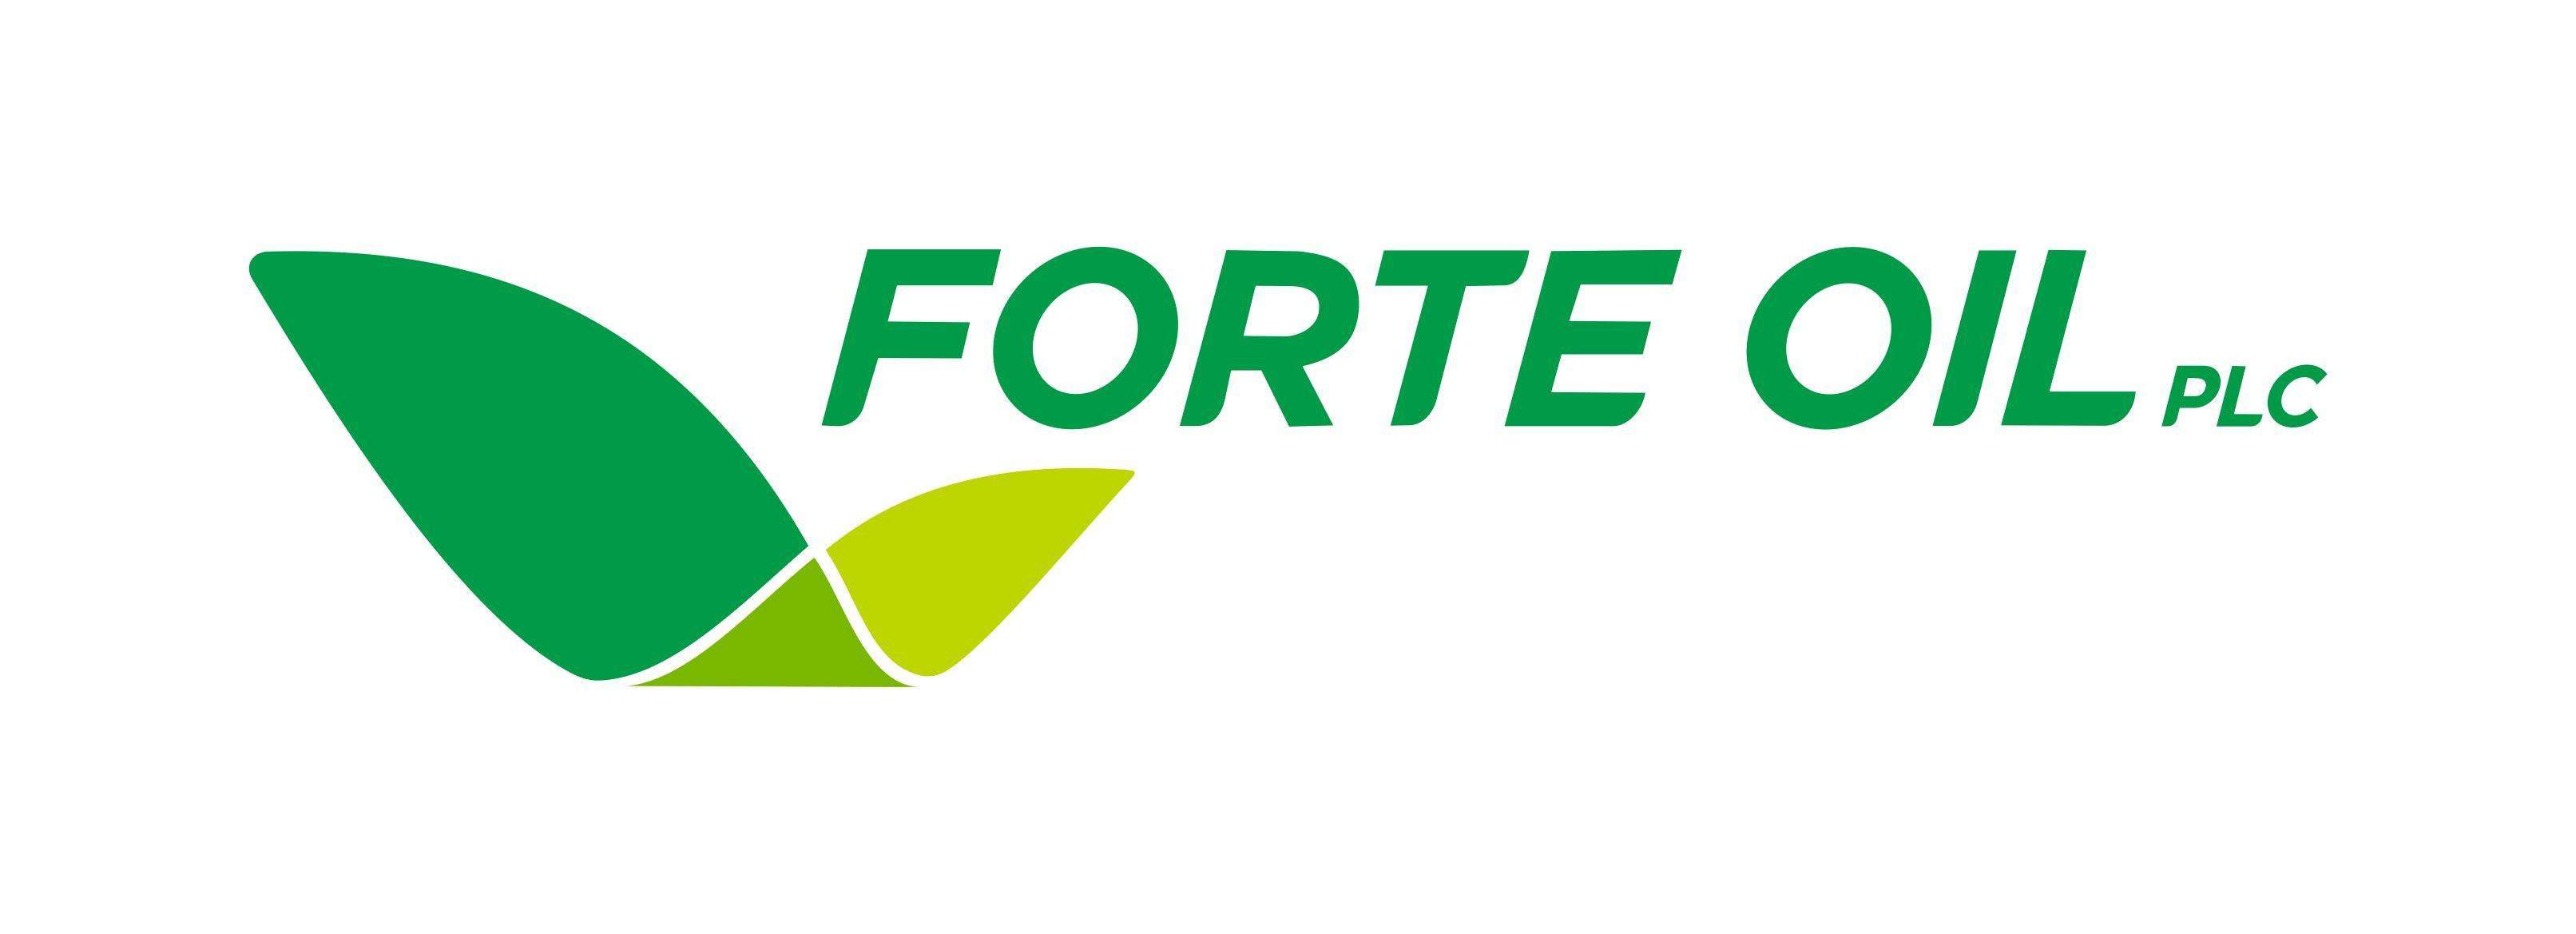 Forte Oil Records N3 Billion Profit After Tax in Nine Months